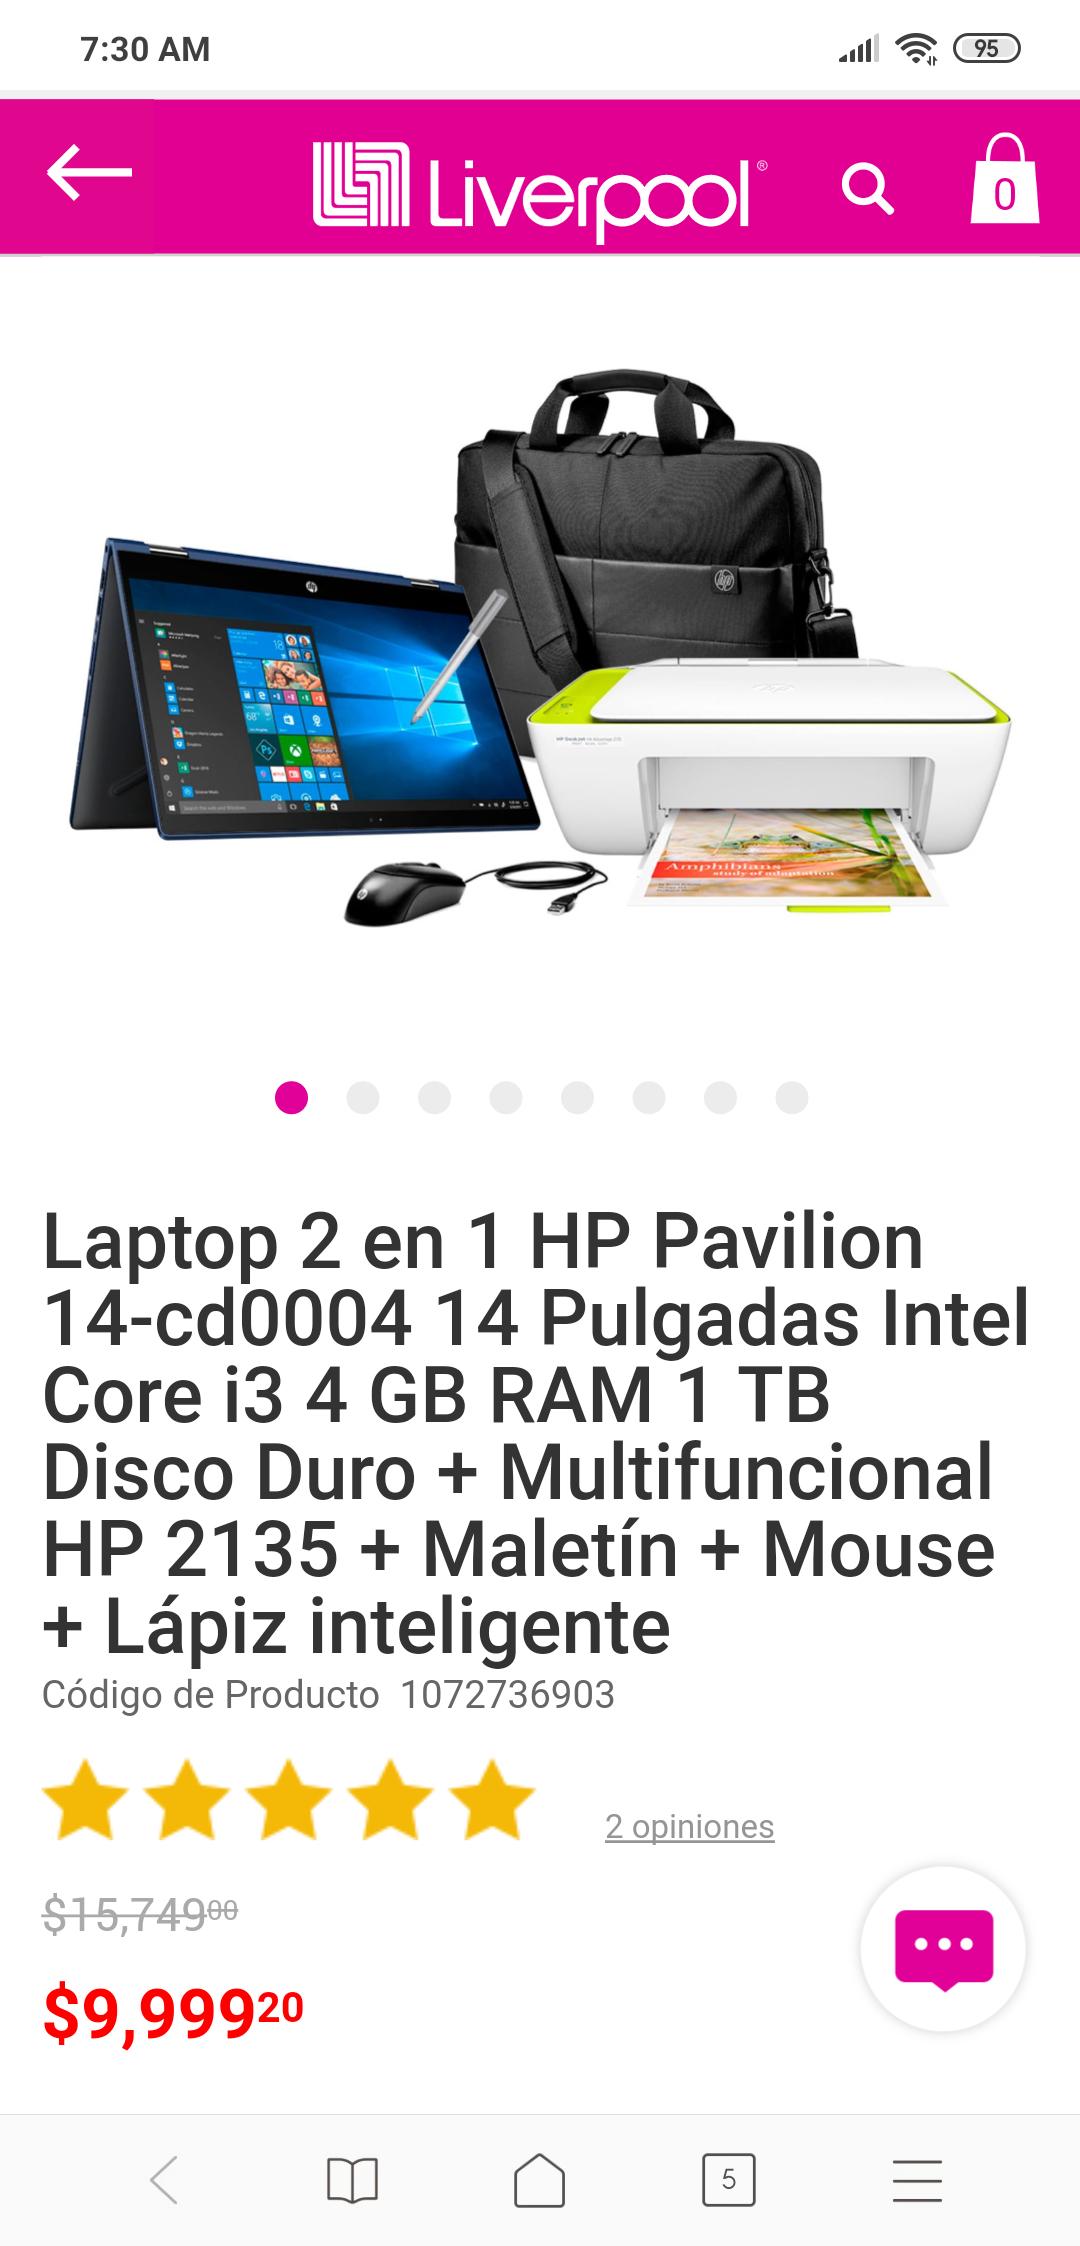 Liverpool: Laptop 2 en 1 + multifuncional + lápiz inteligente + mouse + maletin